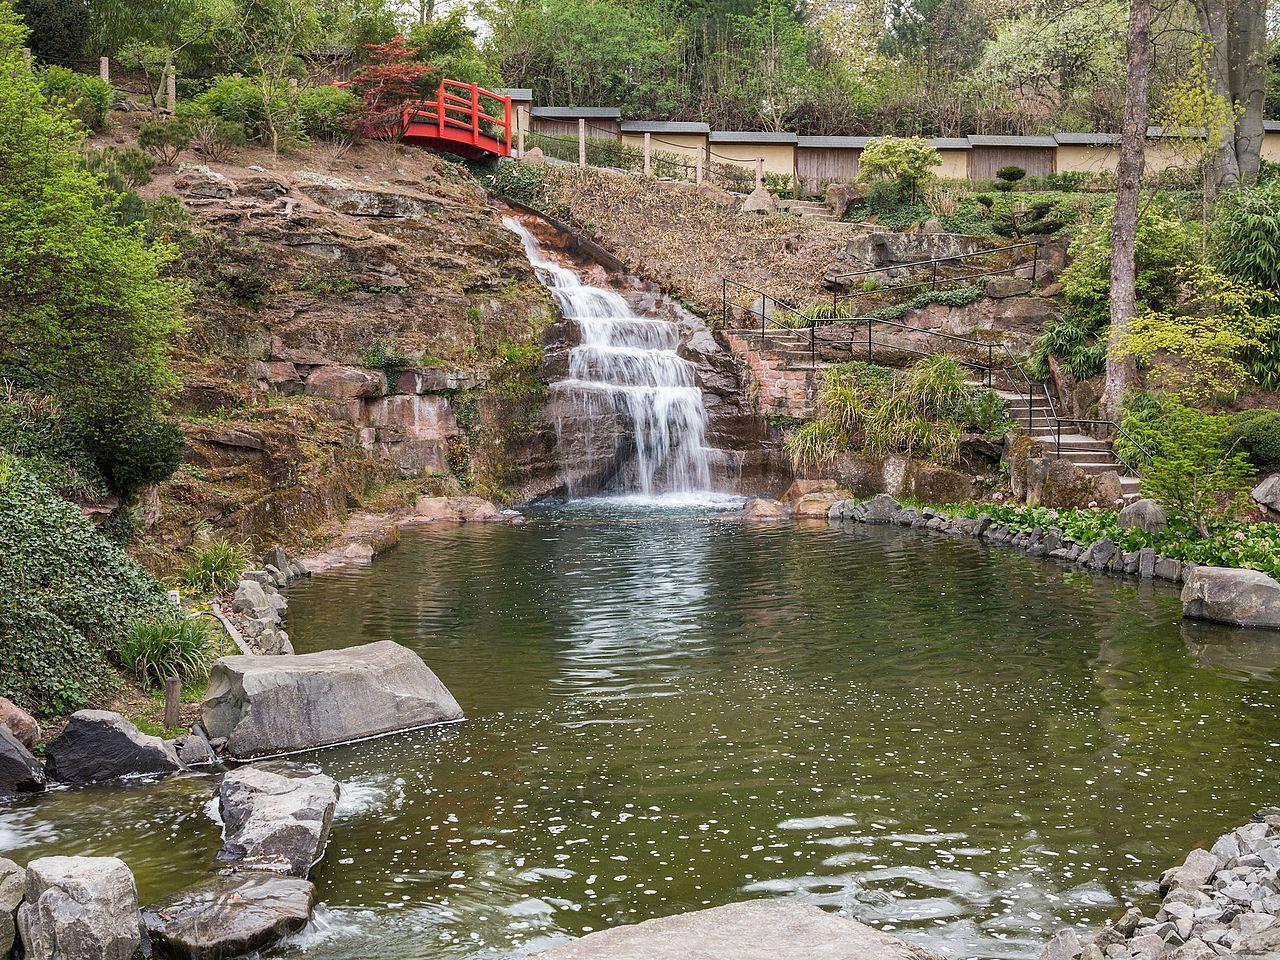 File wasserfall am unteren teich japanischer garten for Wasserfall teich